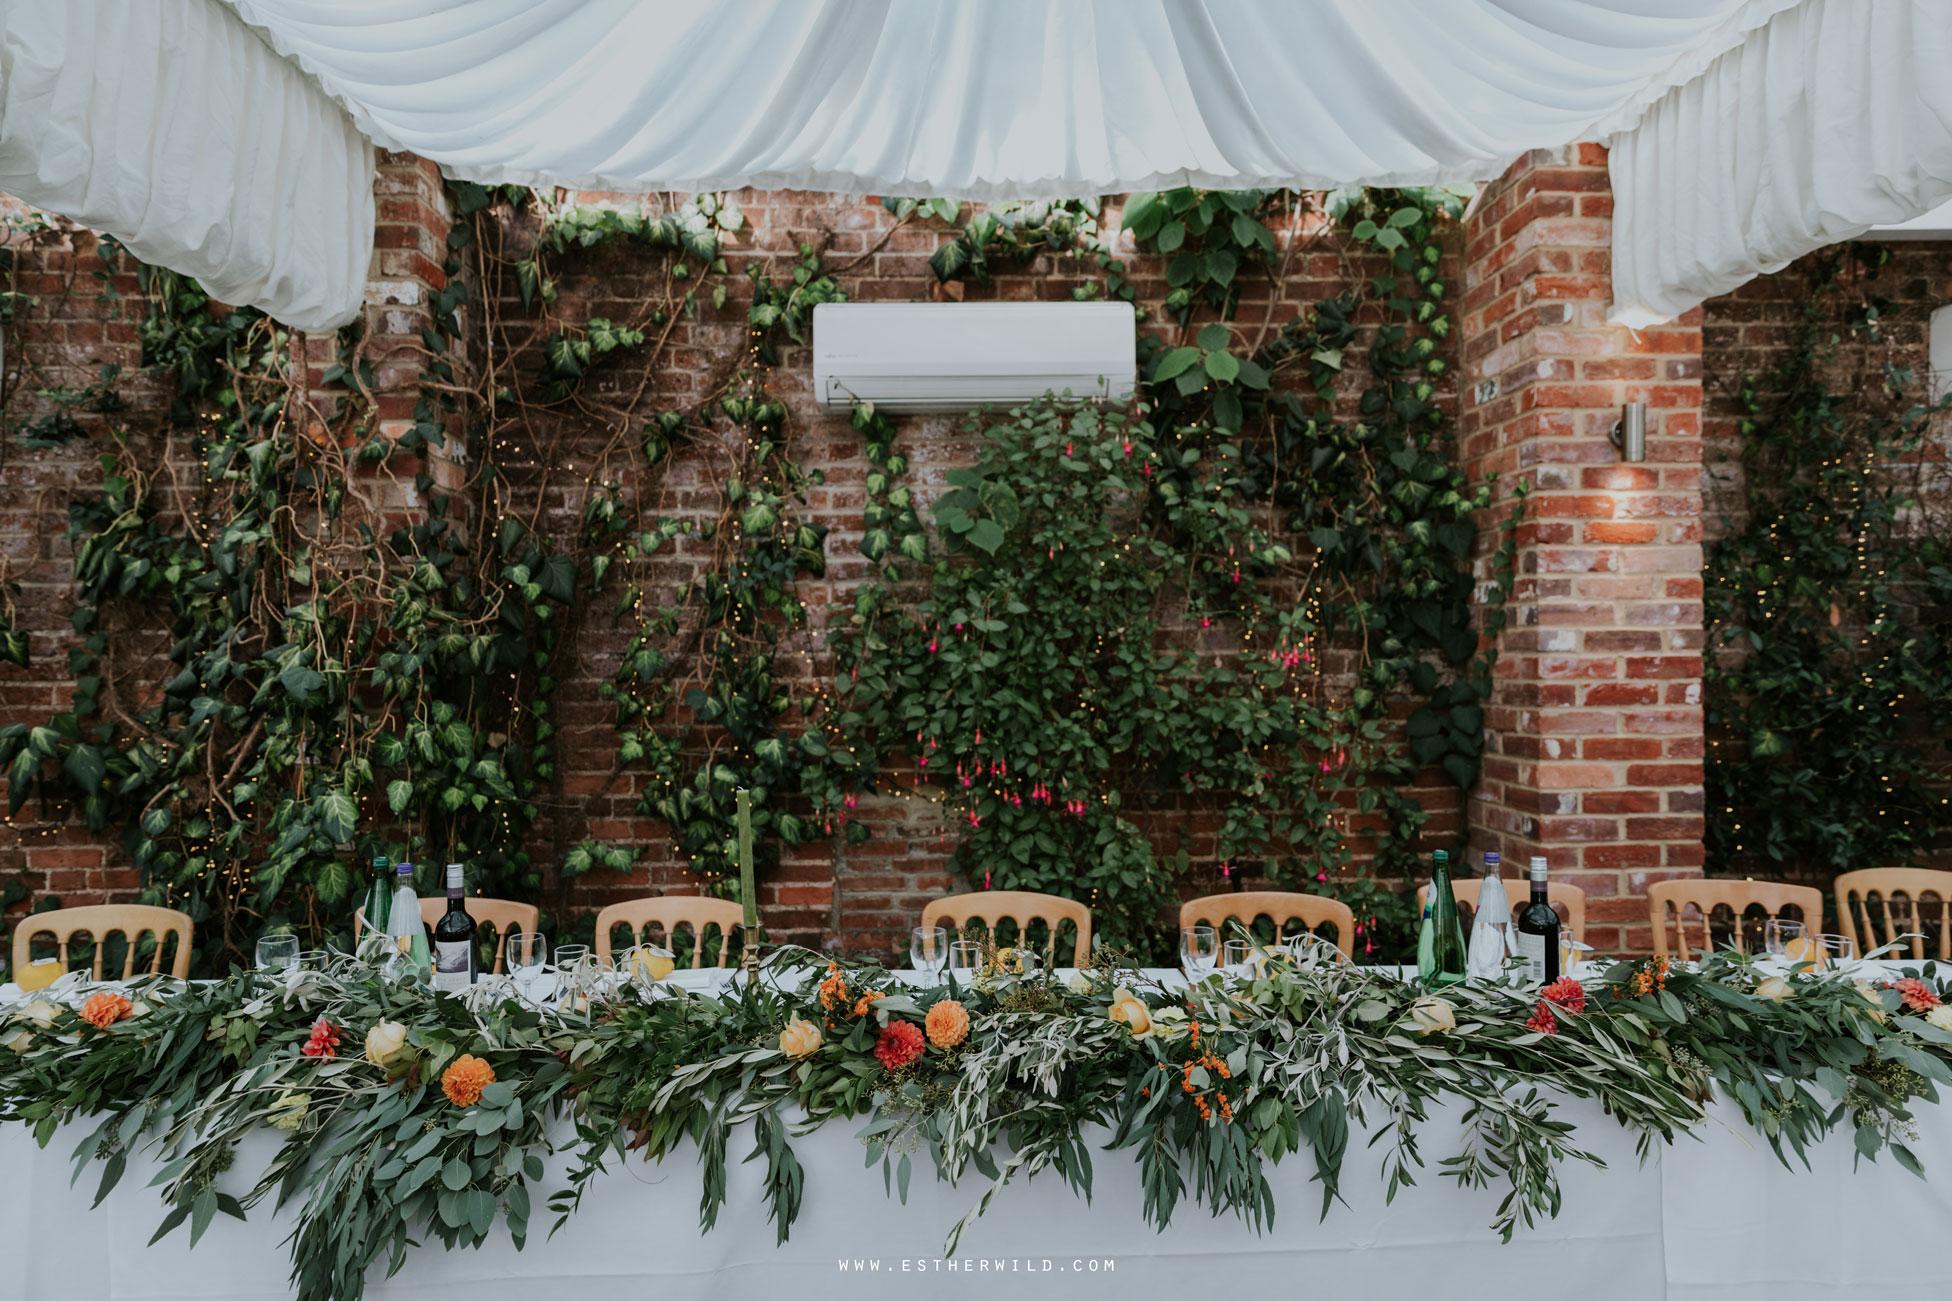 Northbrook_Park_Farnham_Surrey_London_Wedding_Hindu_Fusion_Esther_Wild_Photographer_IMG_5707.jpg